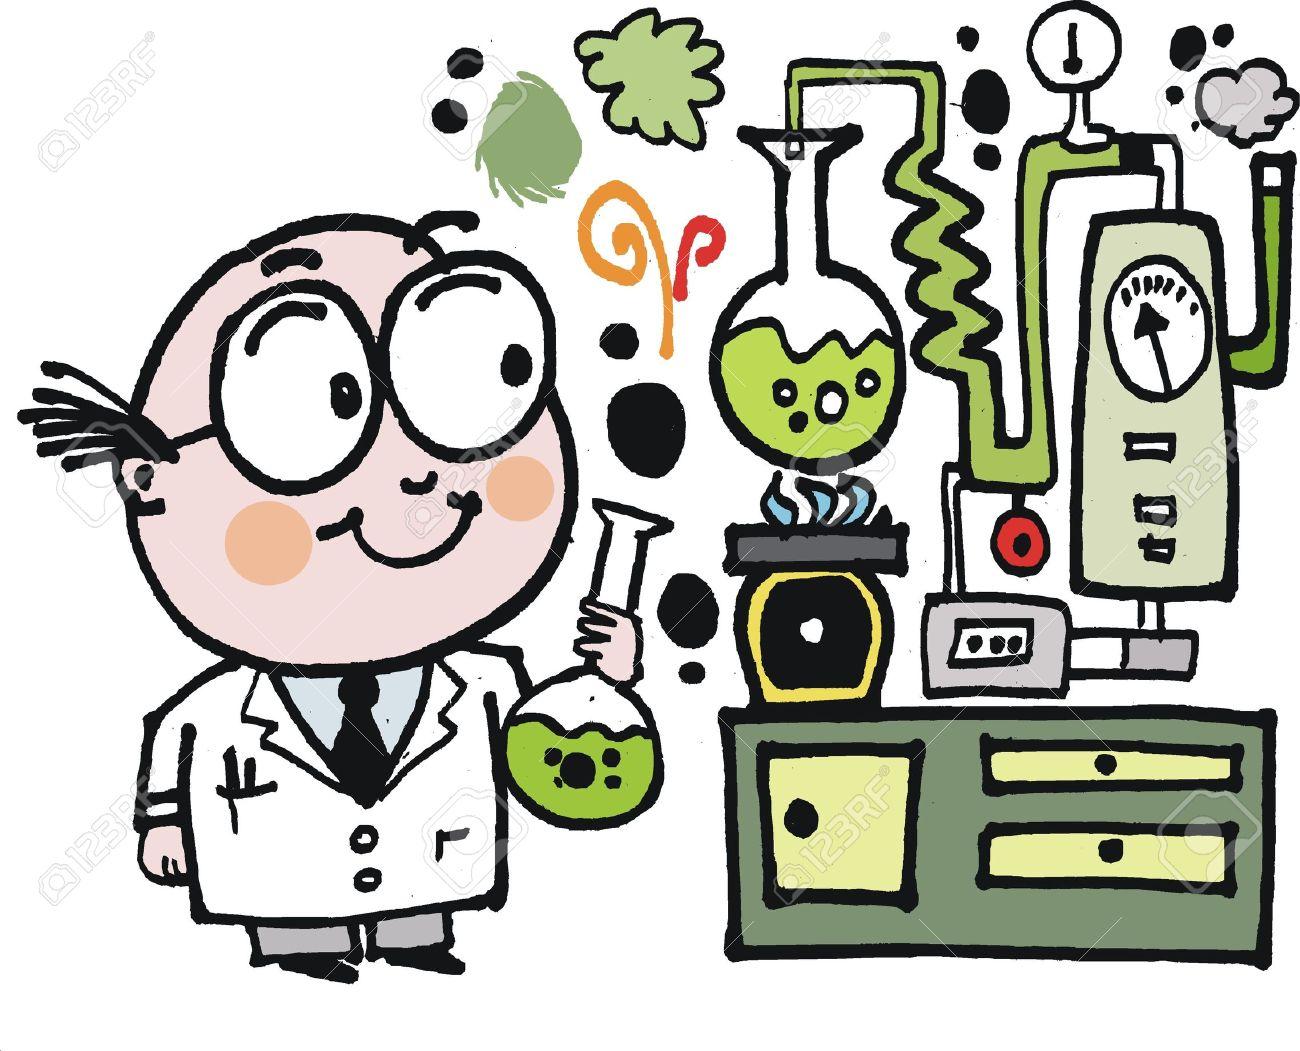 Laboratorio de Qumica